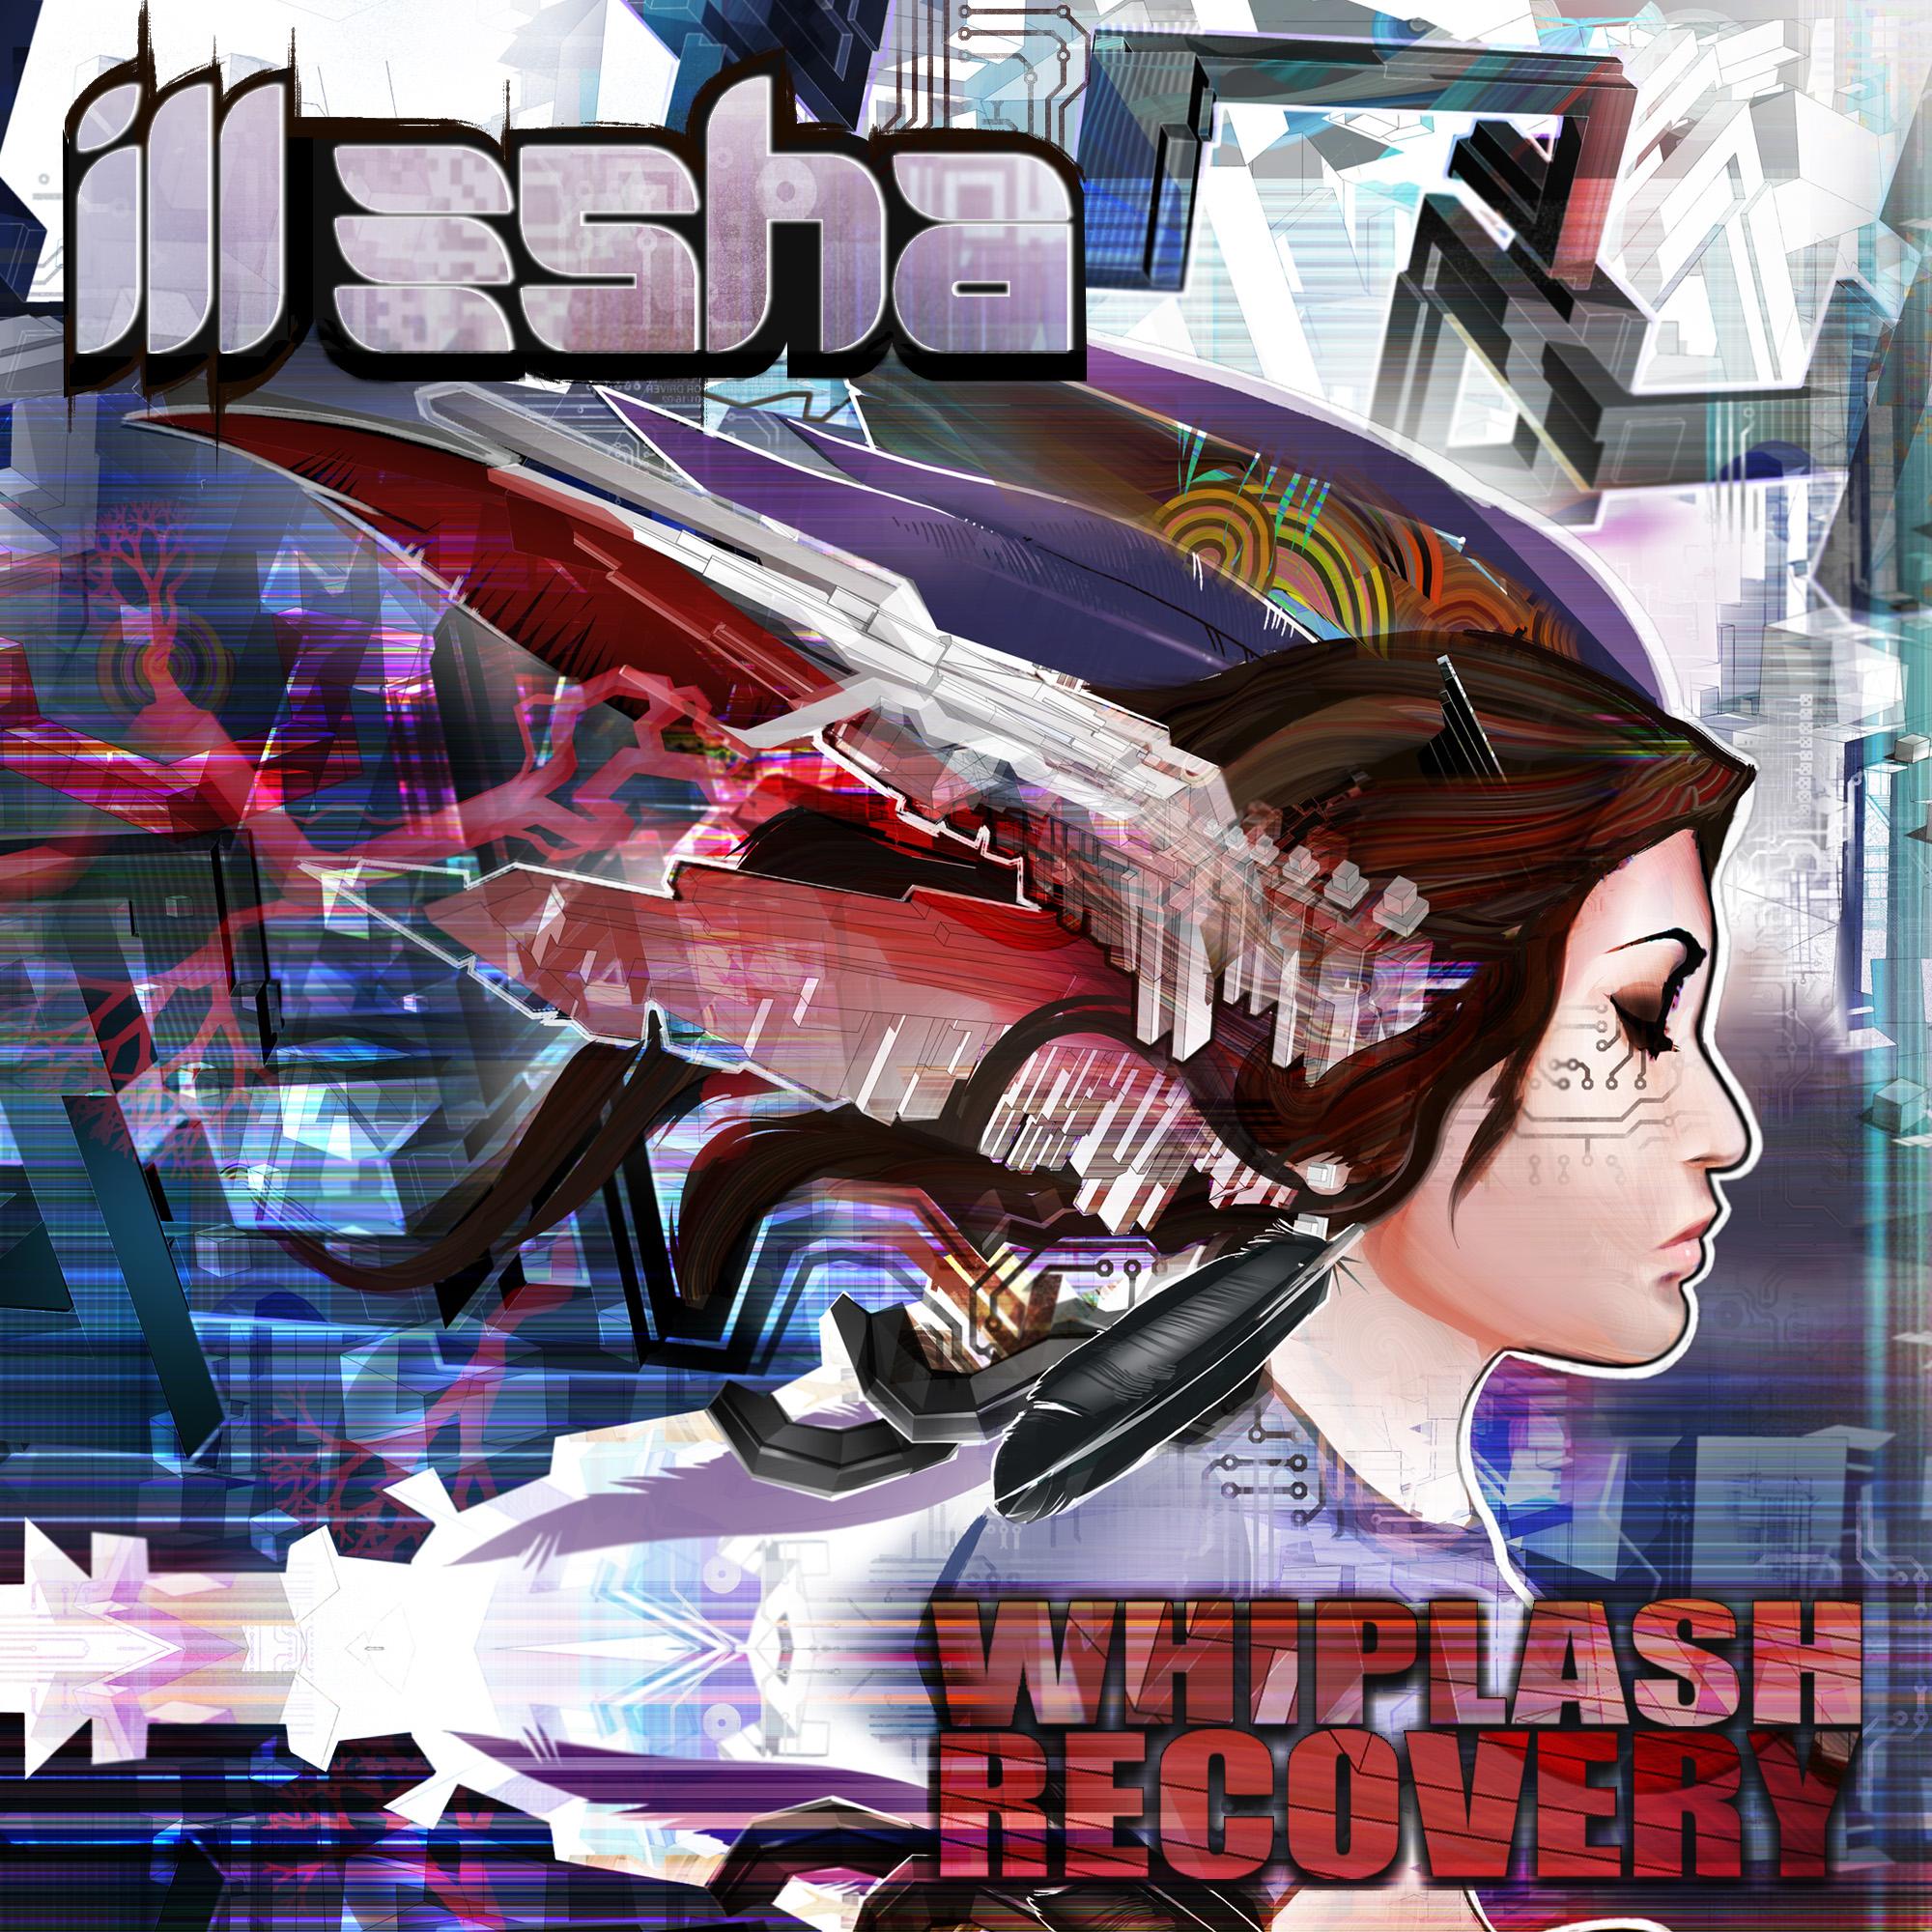 ill-esha - Whiplash Recorvery